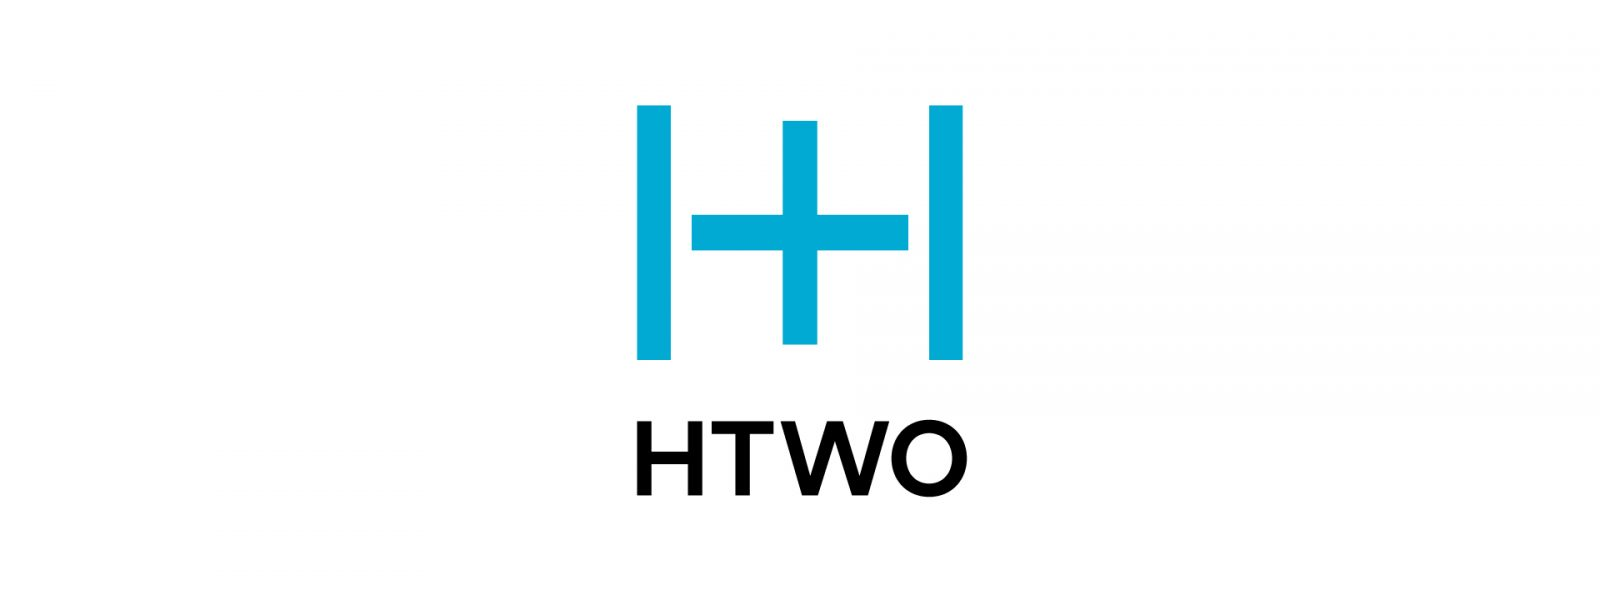 Hyundai Launches Htwo E2e